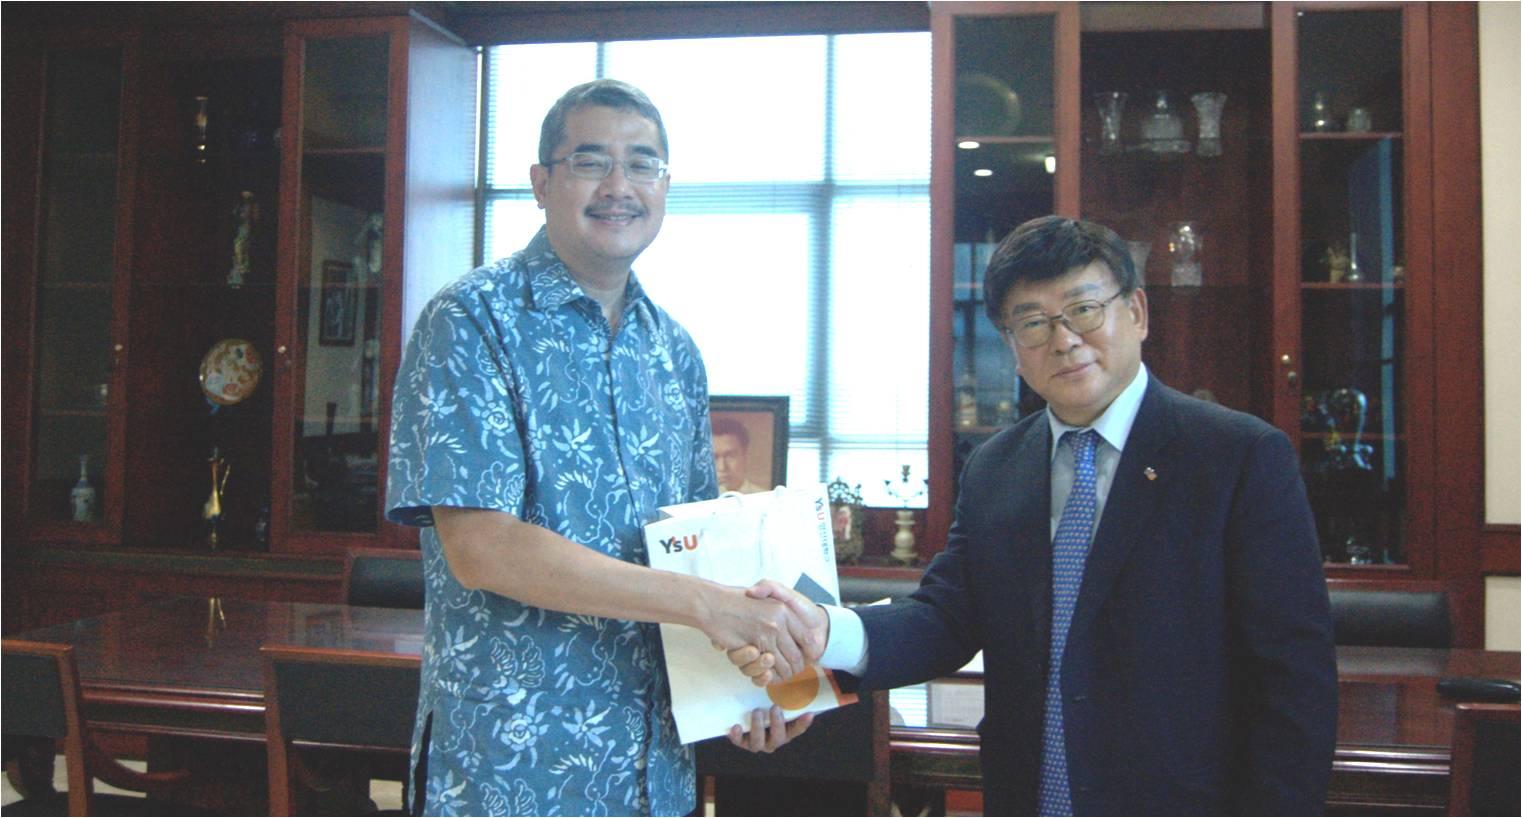 Kerjasama Universitas Esa Unggul dengan Youngsan University